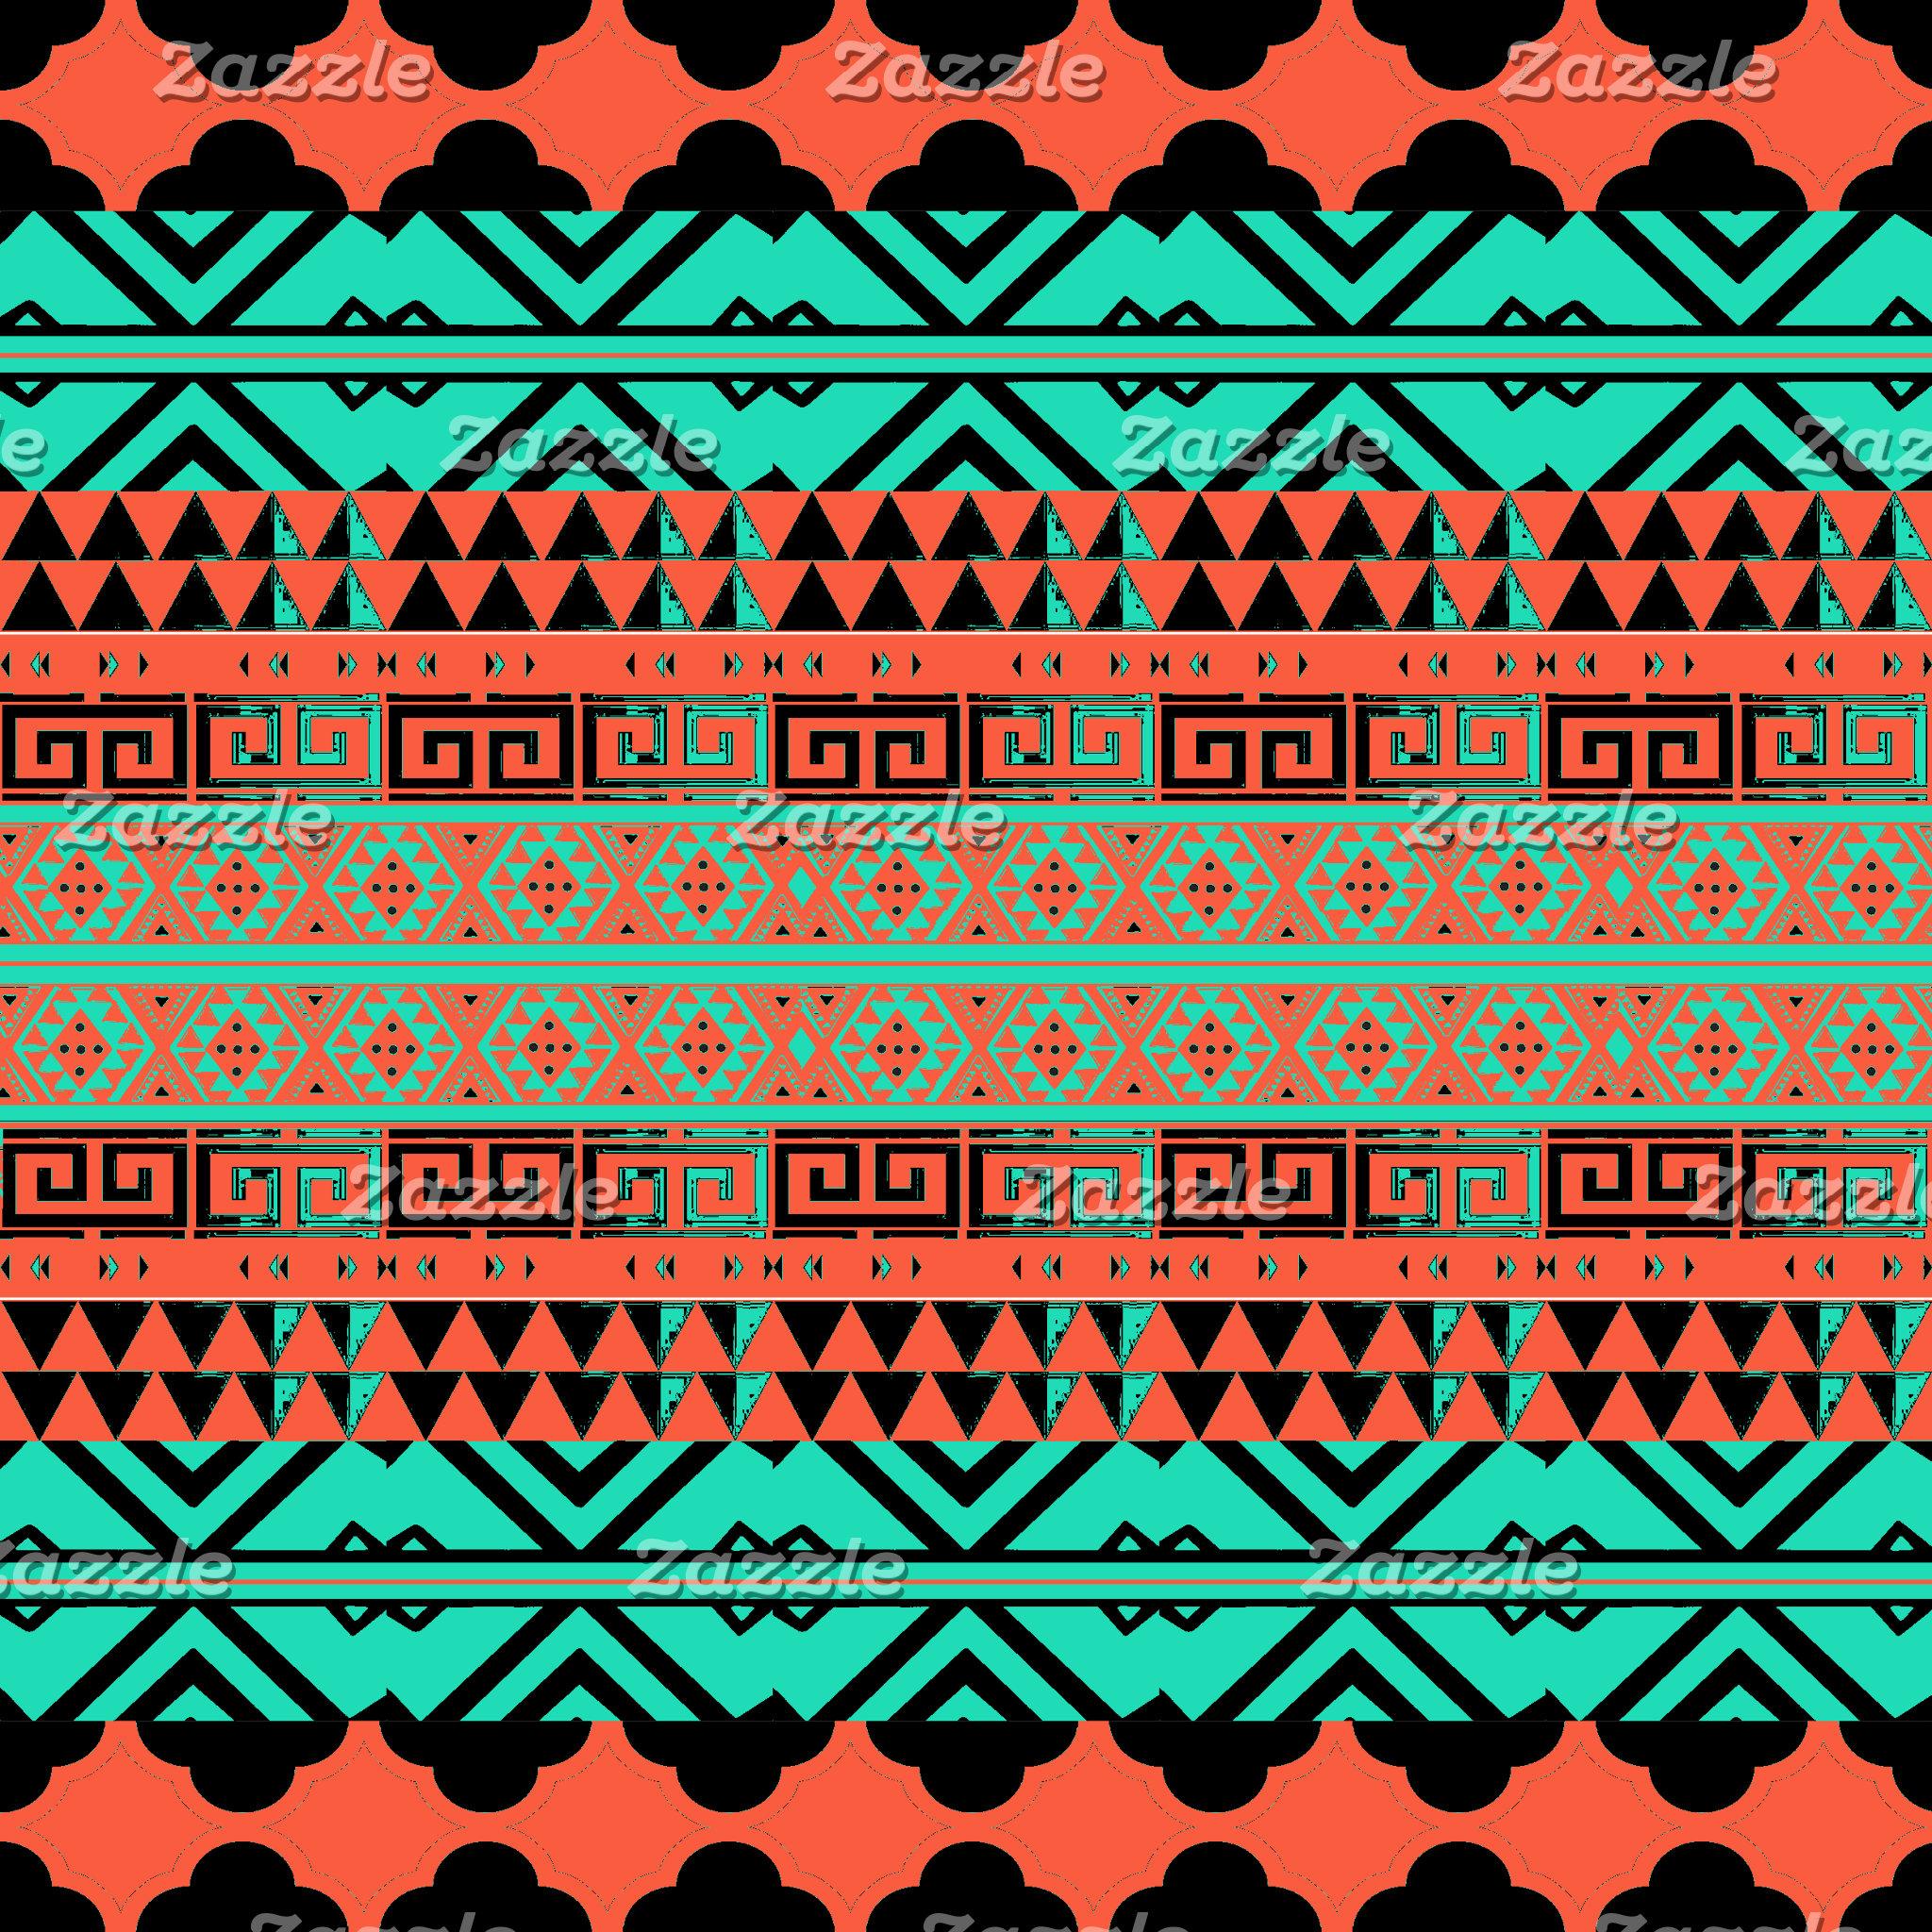 Aztec, Native, Mayan Inspired Pillows